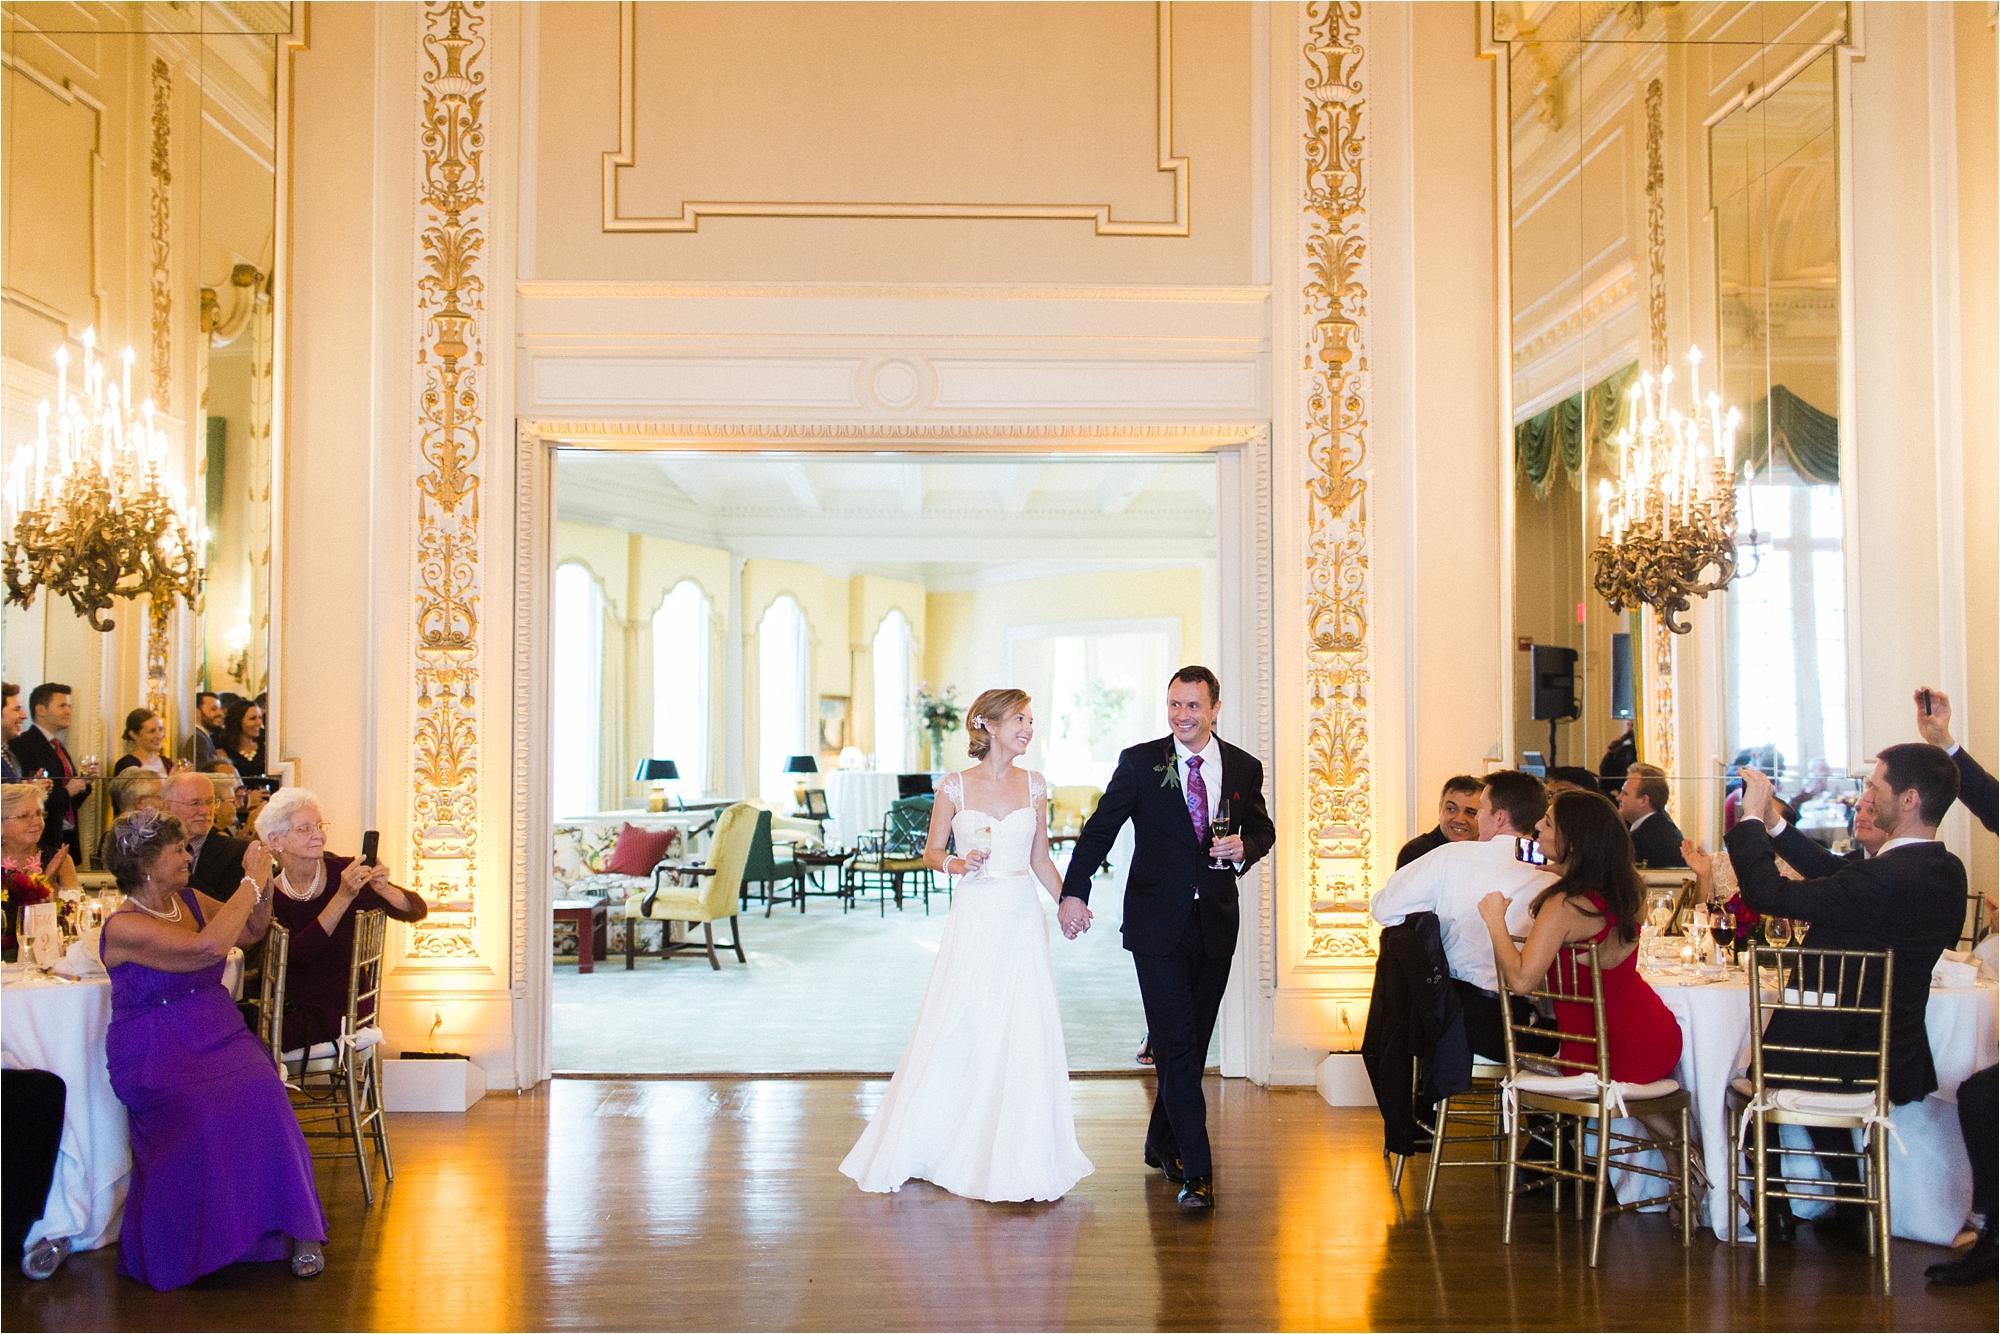 stephanie-yonce-photography-elegant-private-club-washington-dc-wedding-photos_0047.jpg